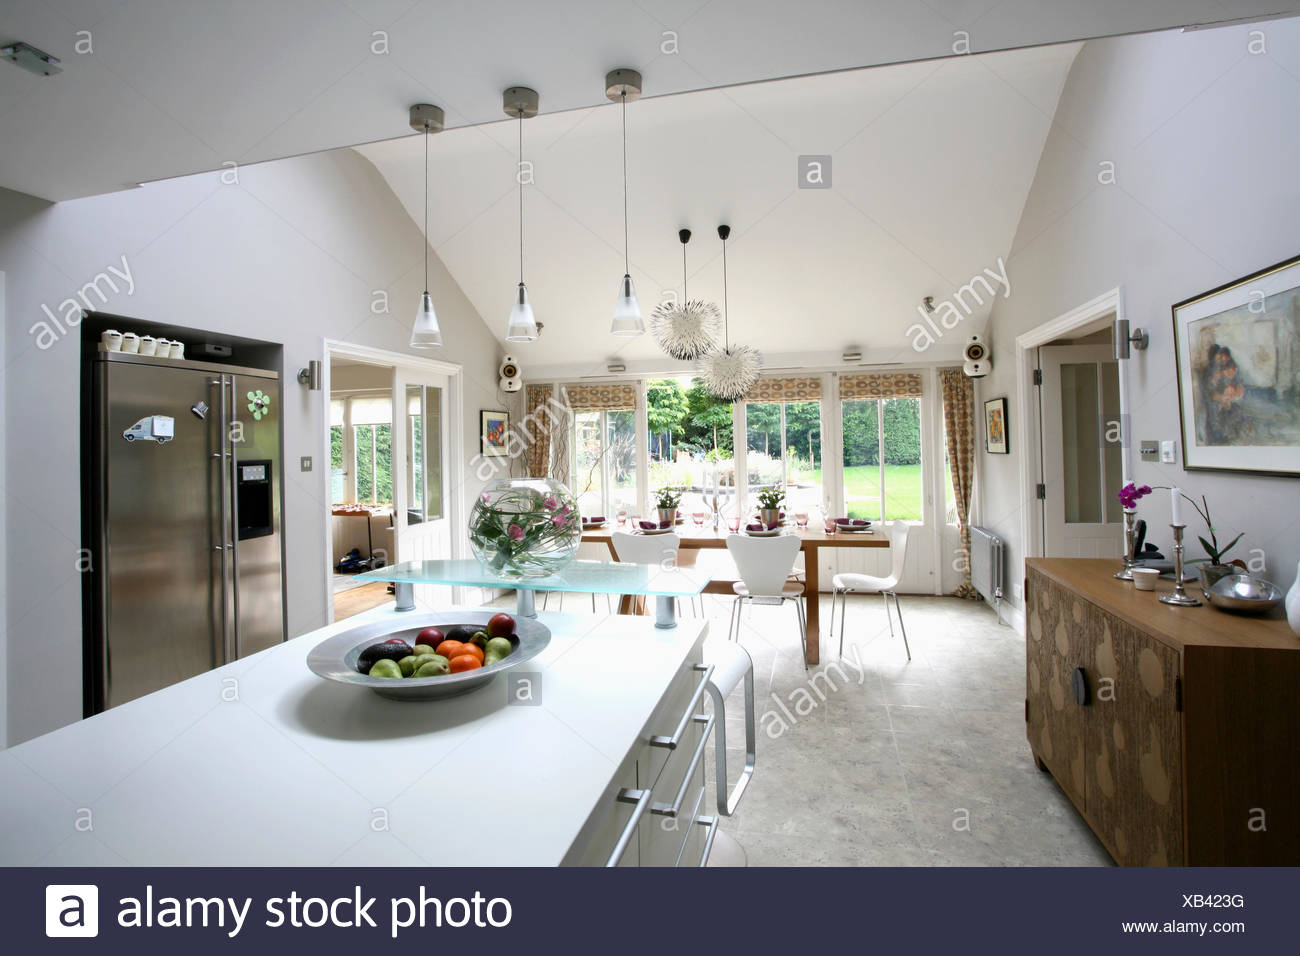 Rectangular Island Unit And Granite Flooring In Large Modern